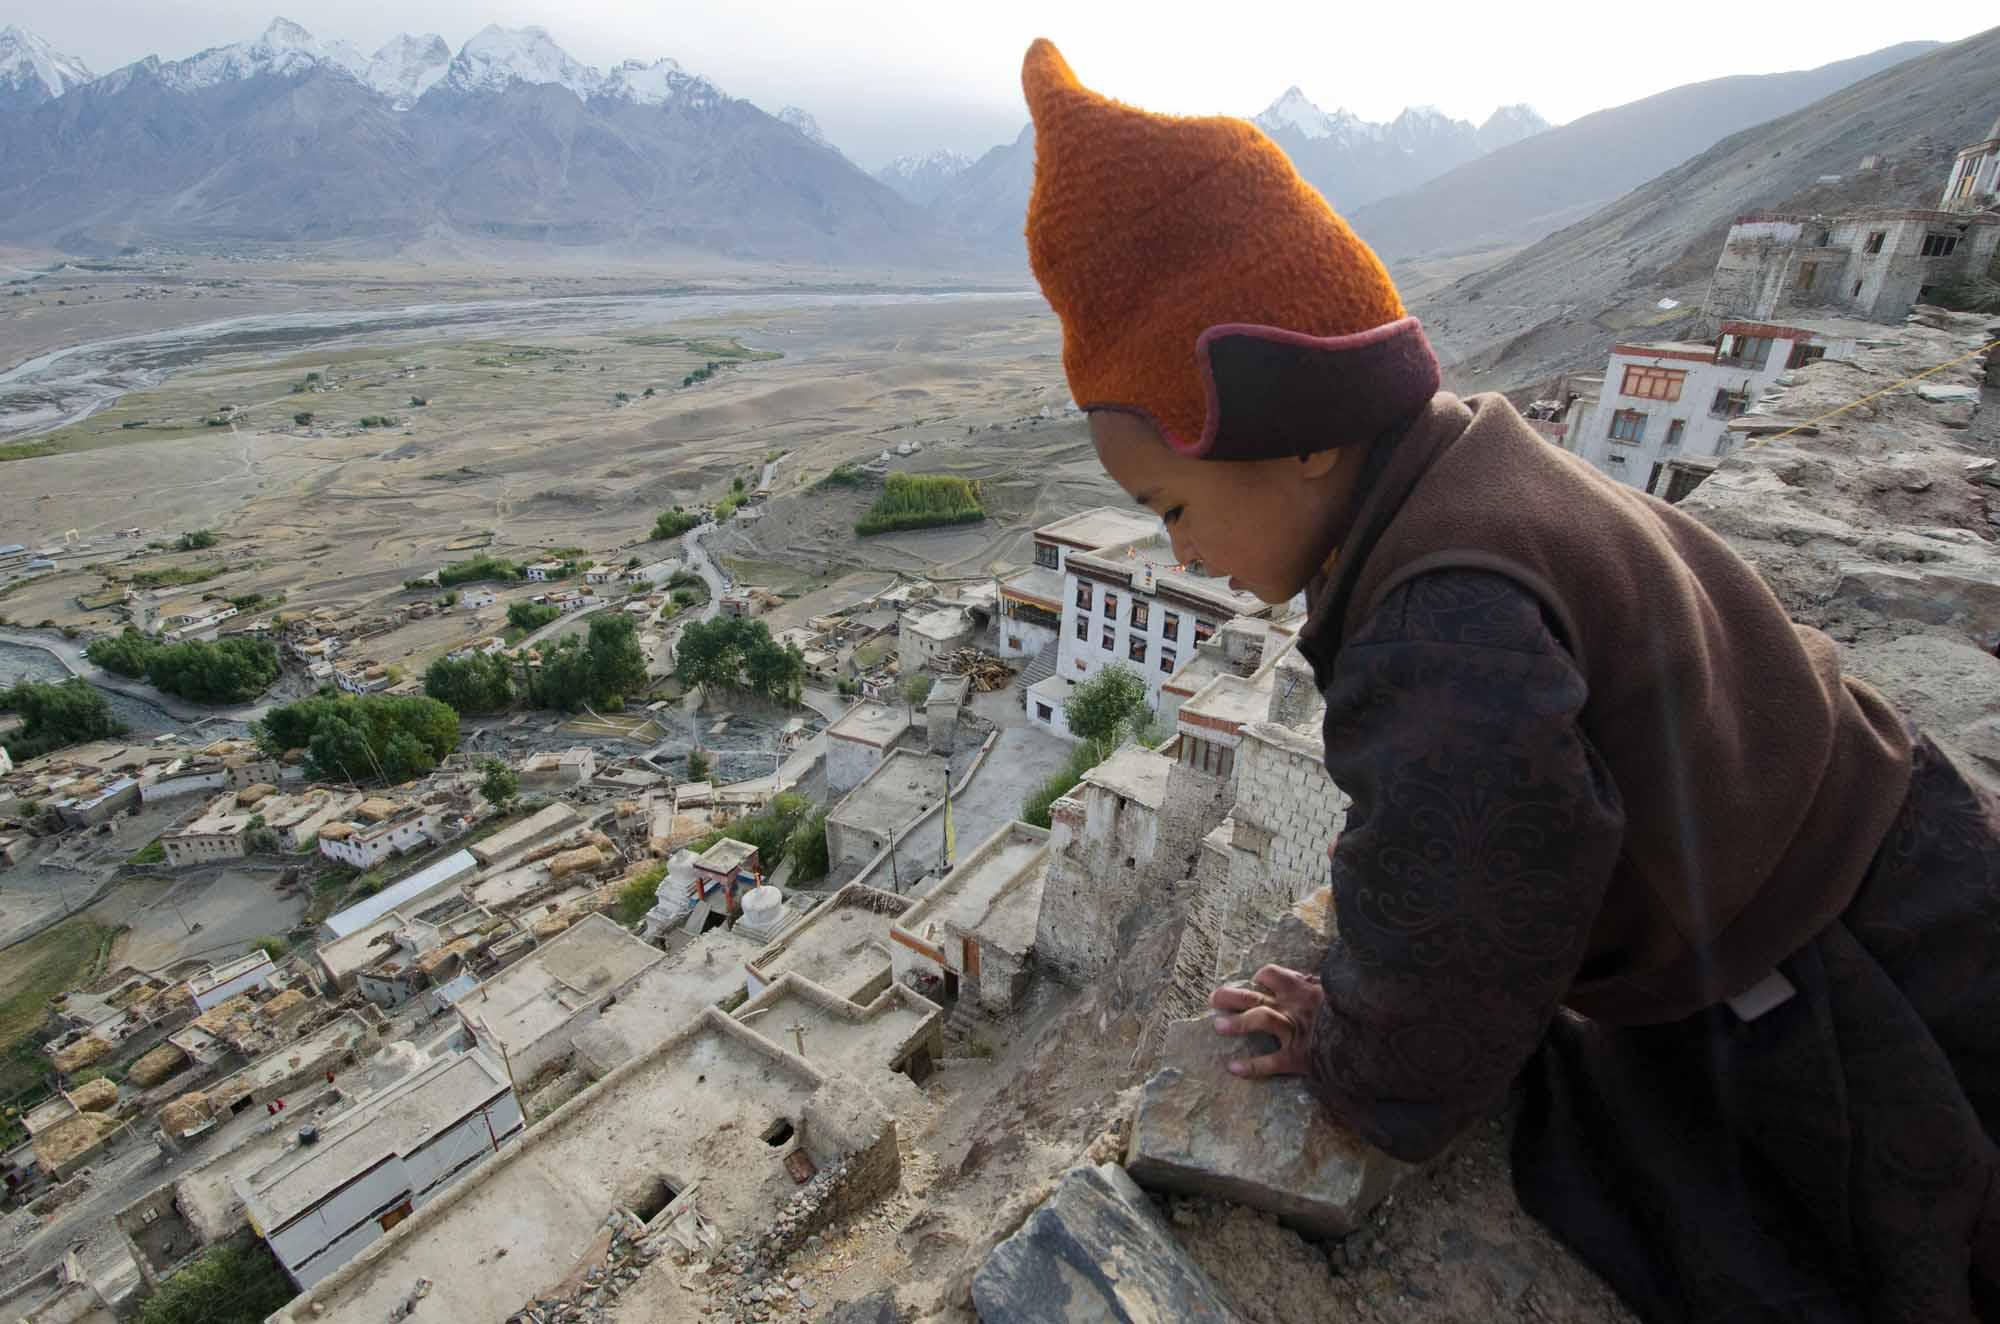 Blue-Sky-Kingdom-Family-Vacation-to-a-Buddhist-Monastery-KarshaGompa-BruceKirkby-Tibetan-child